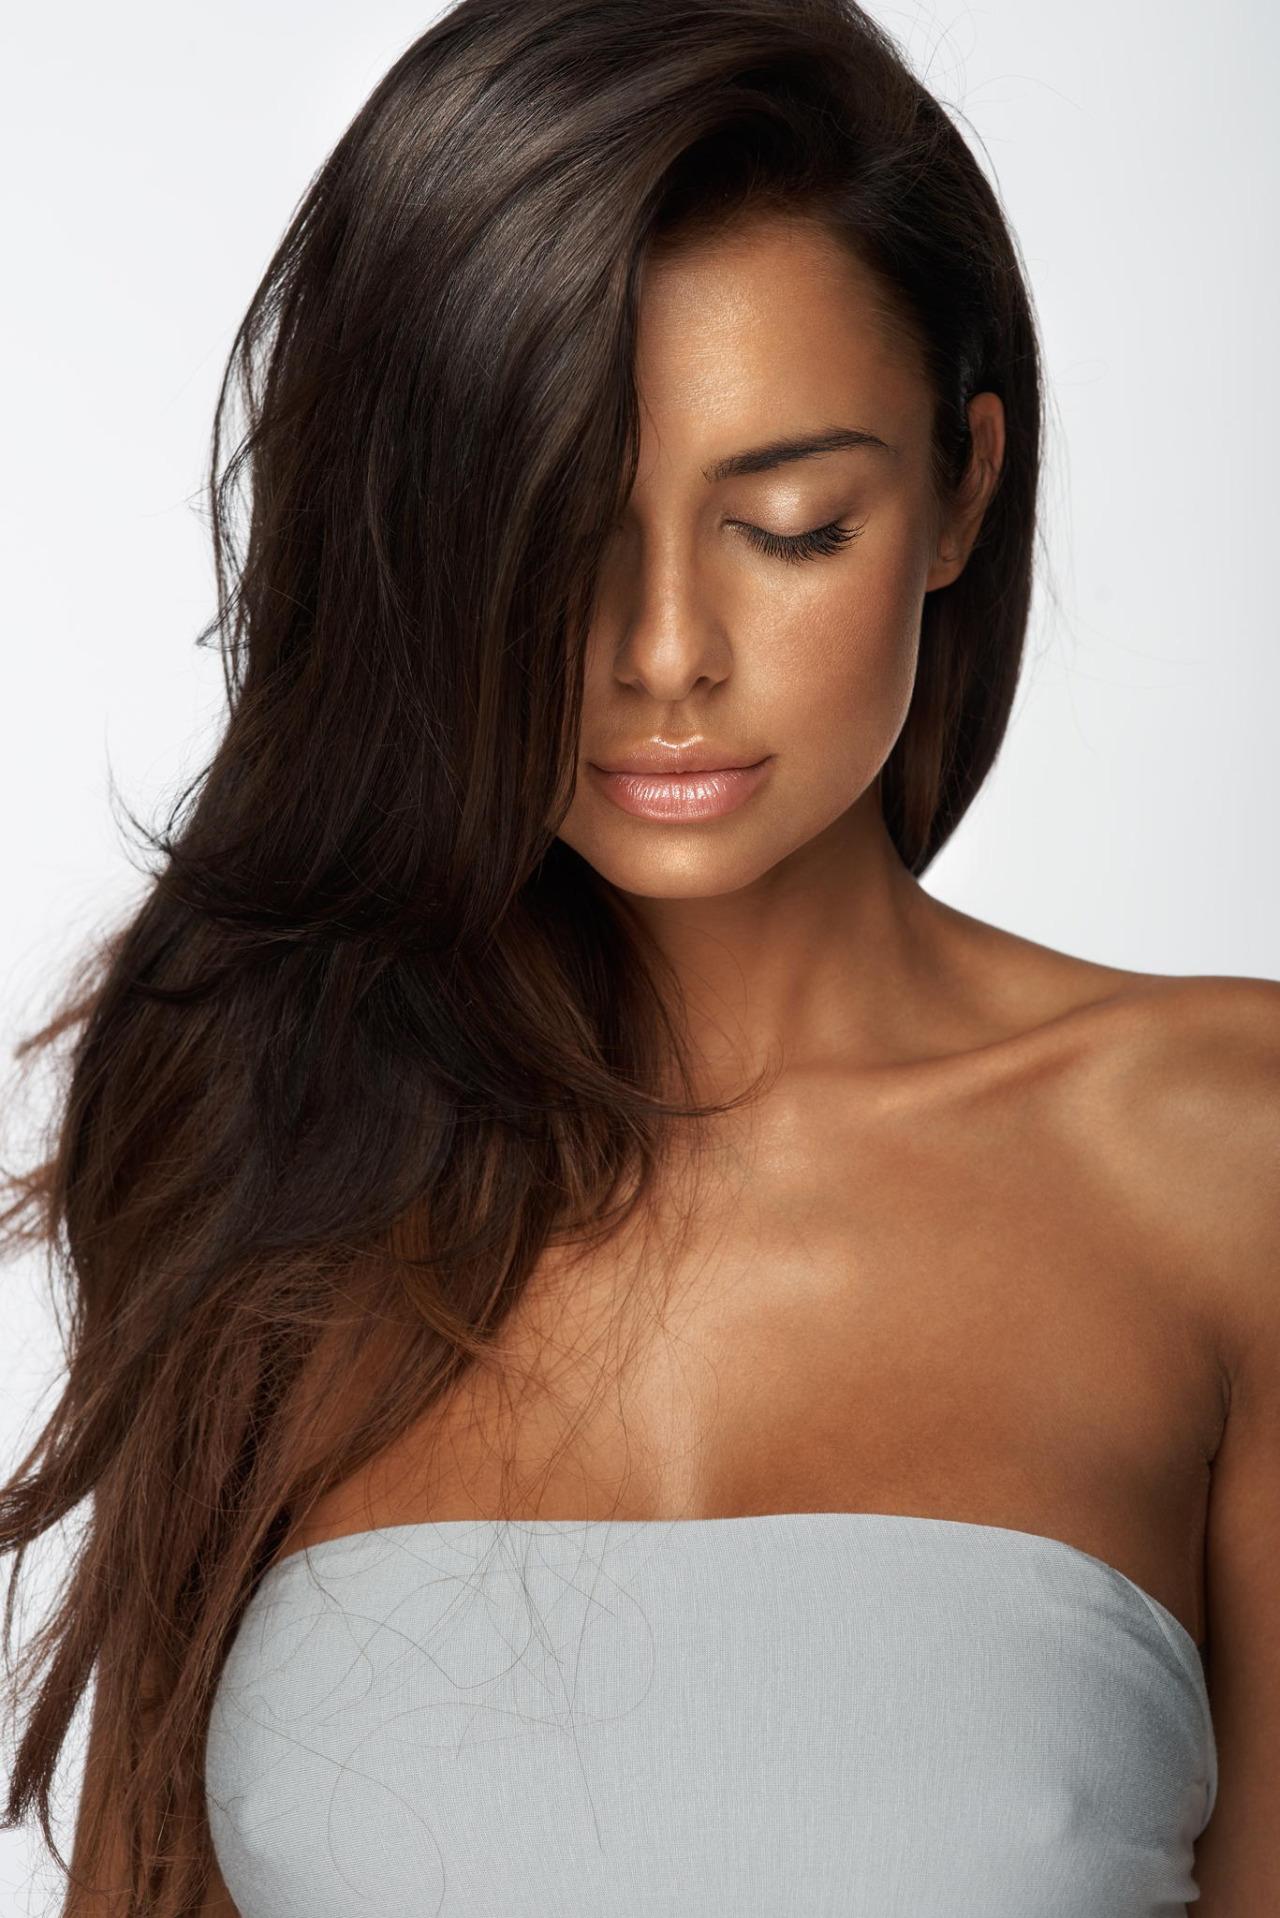 natalia siwiec model girl hair